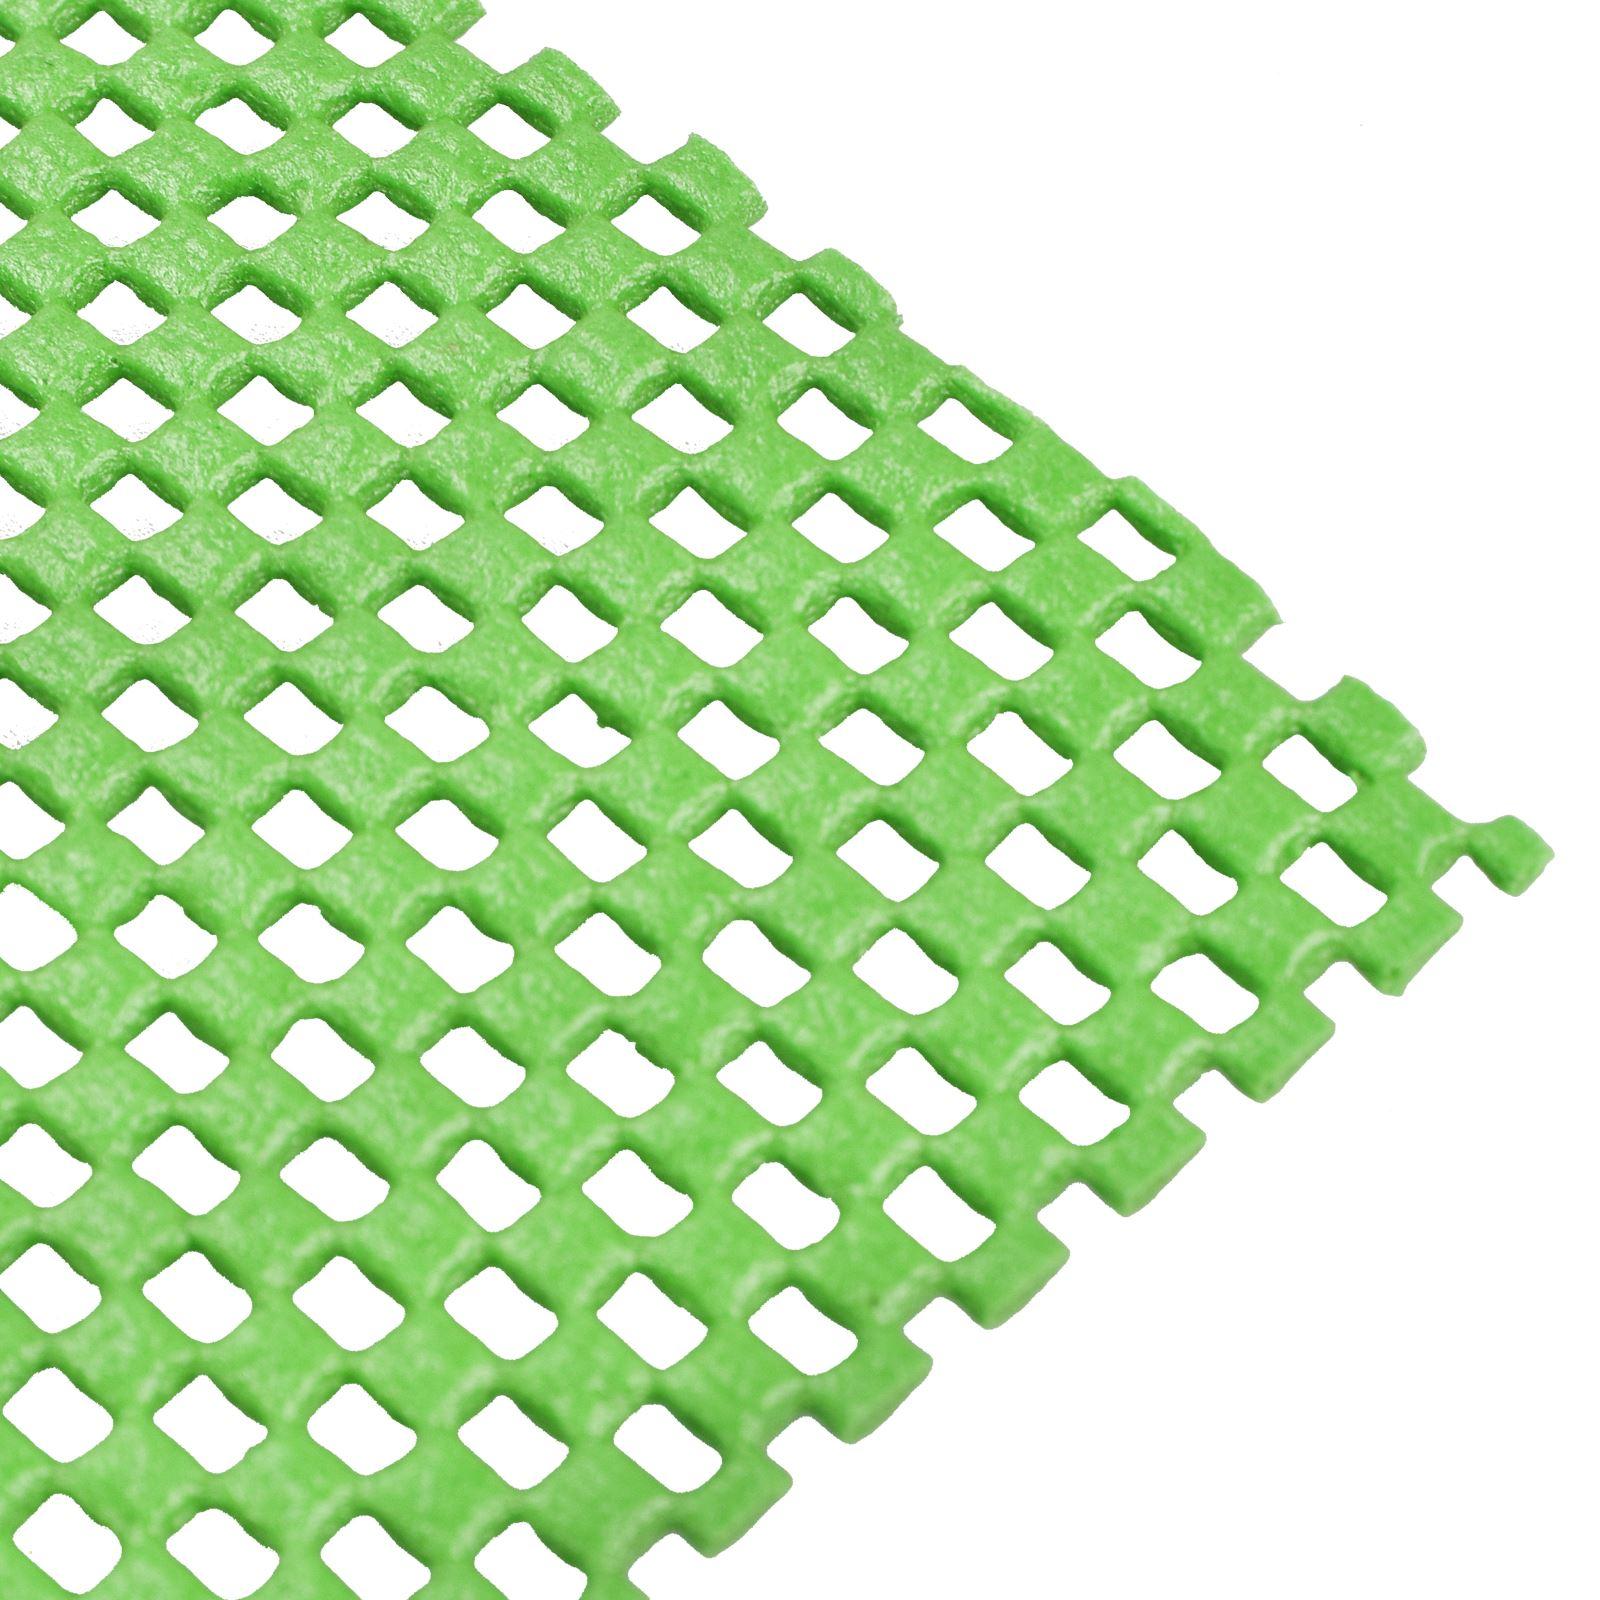 Multi-Purpose-Anti-Non-Slip-Rubber-Mat-Drawer-Liner-Flooring-Gripper-Carpet-Rug thumbnail 9